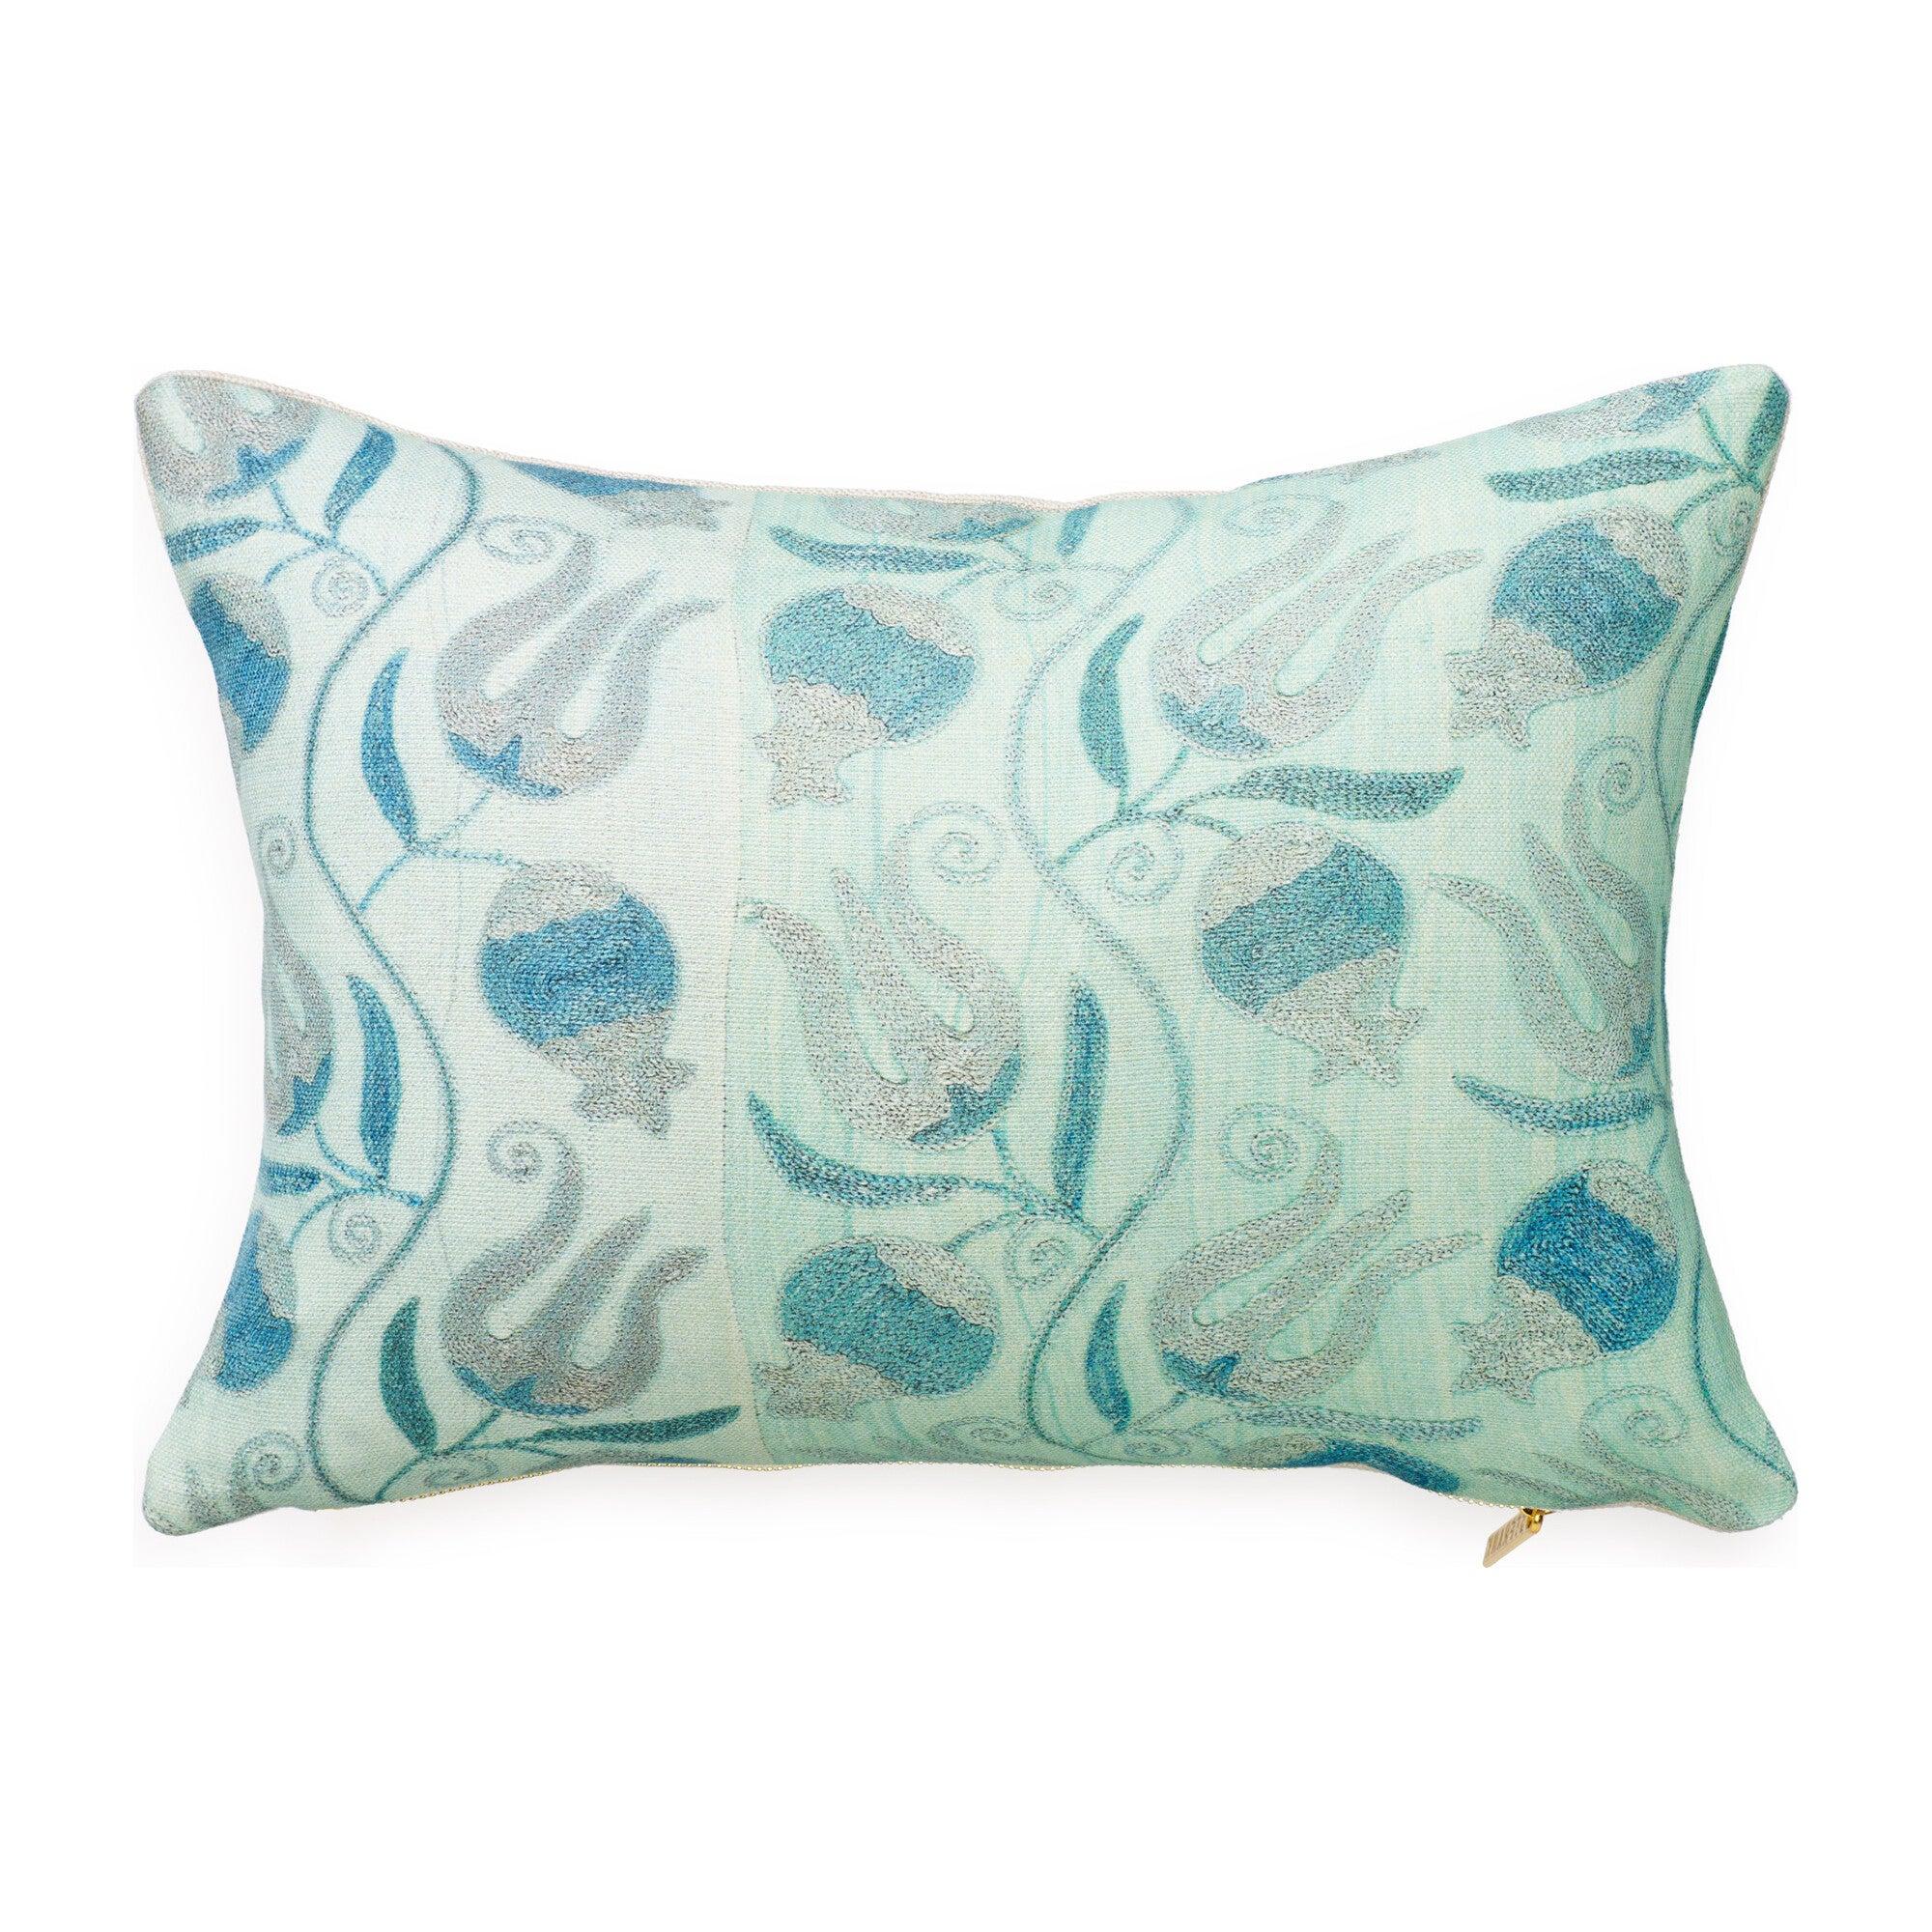 Pomegranate Lumbar Pillow Aqua Home Decor Decorative Pillows Throws Maisonette